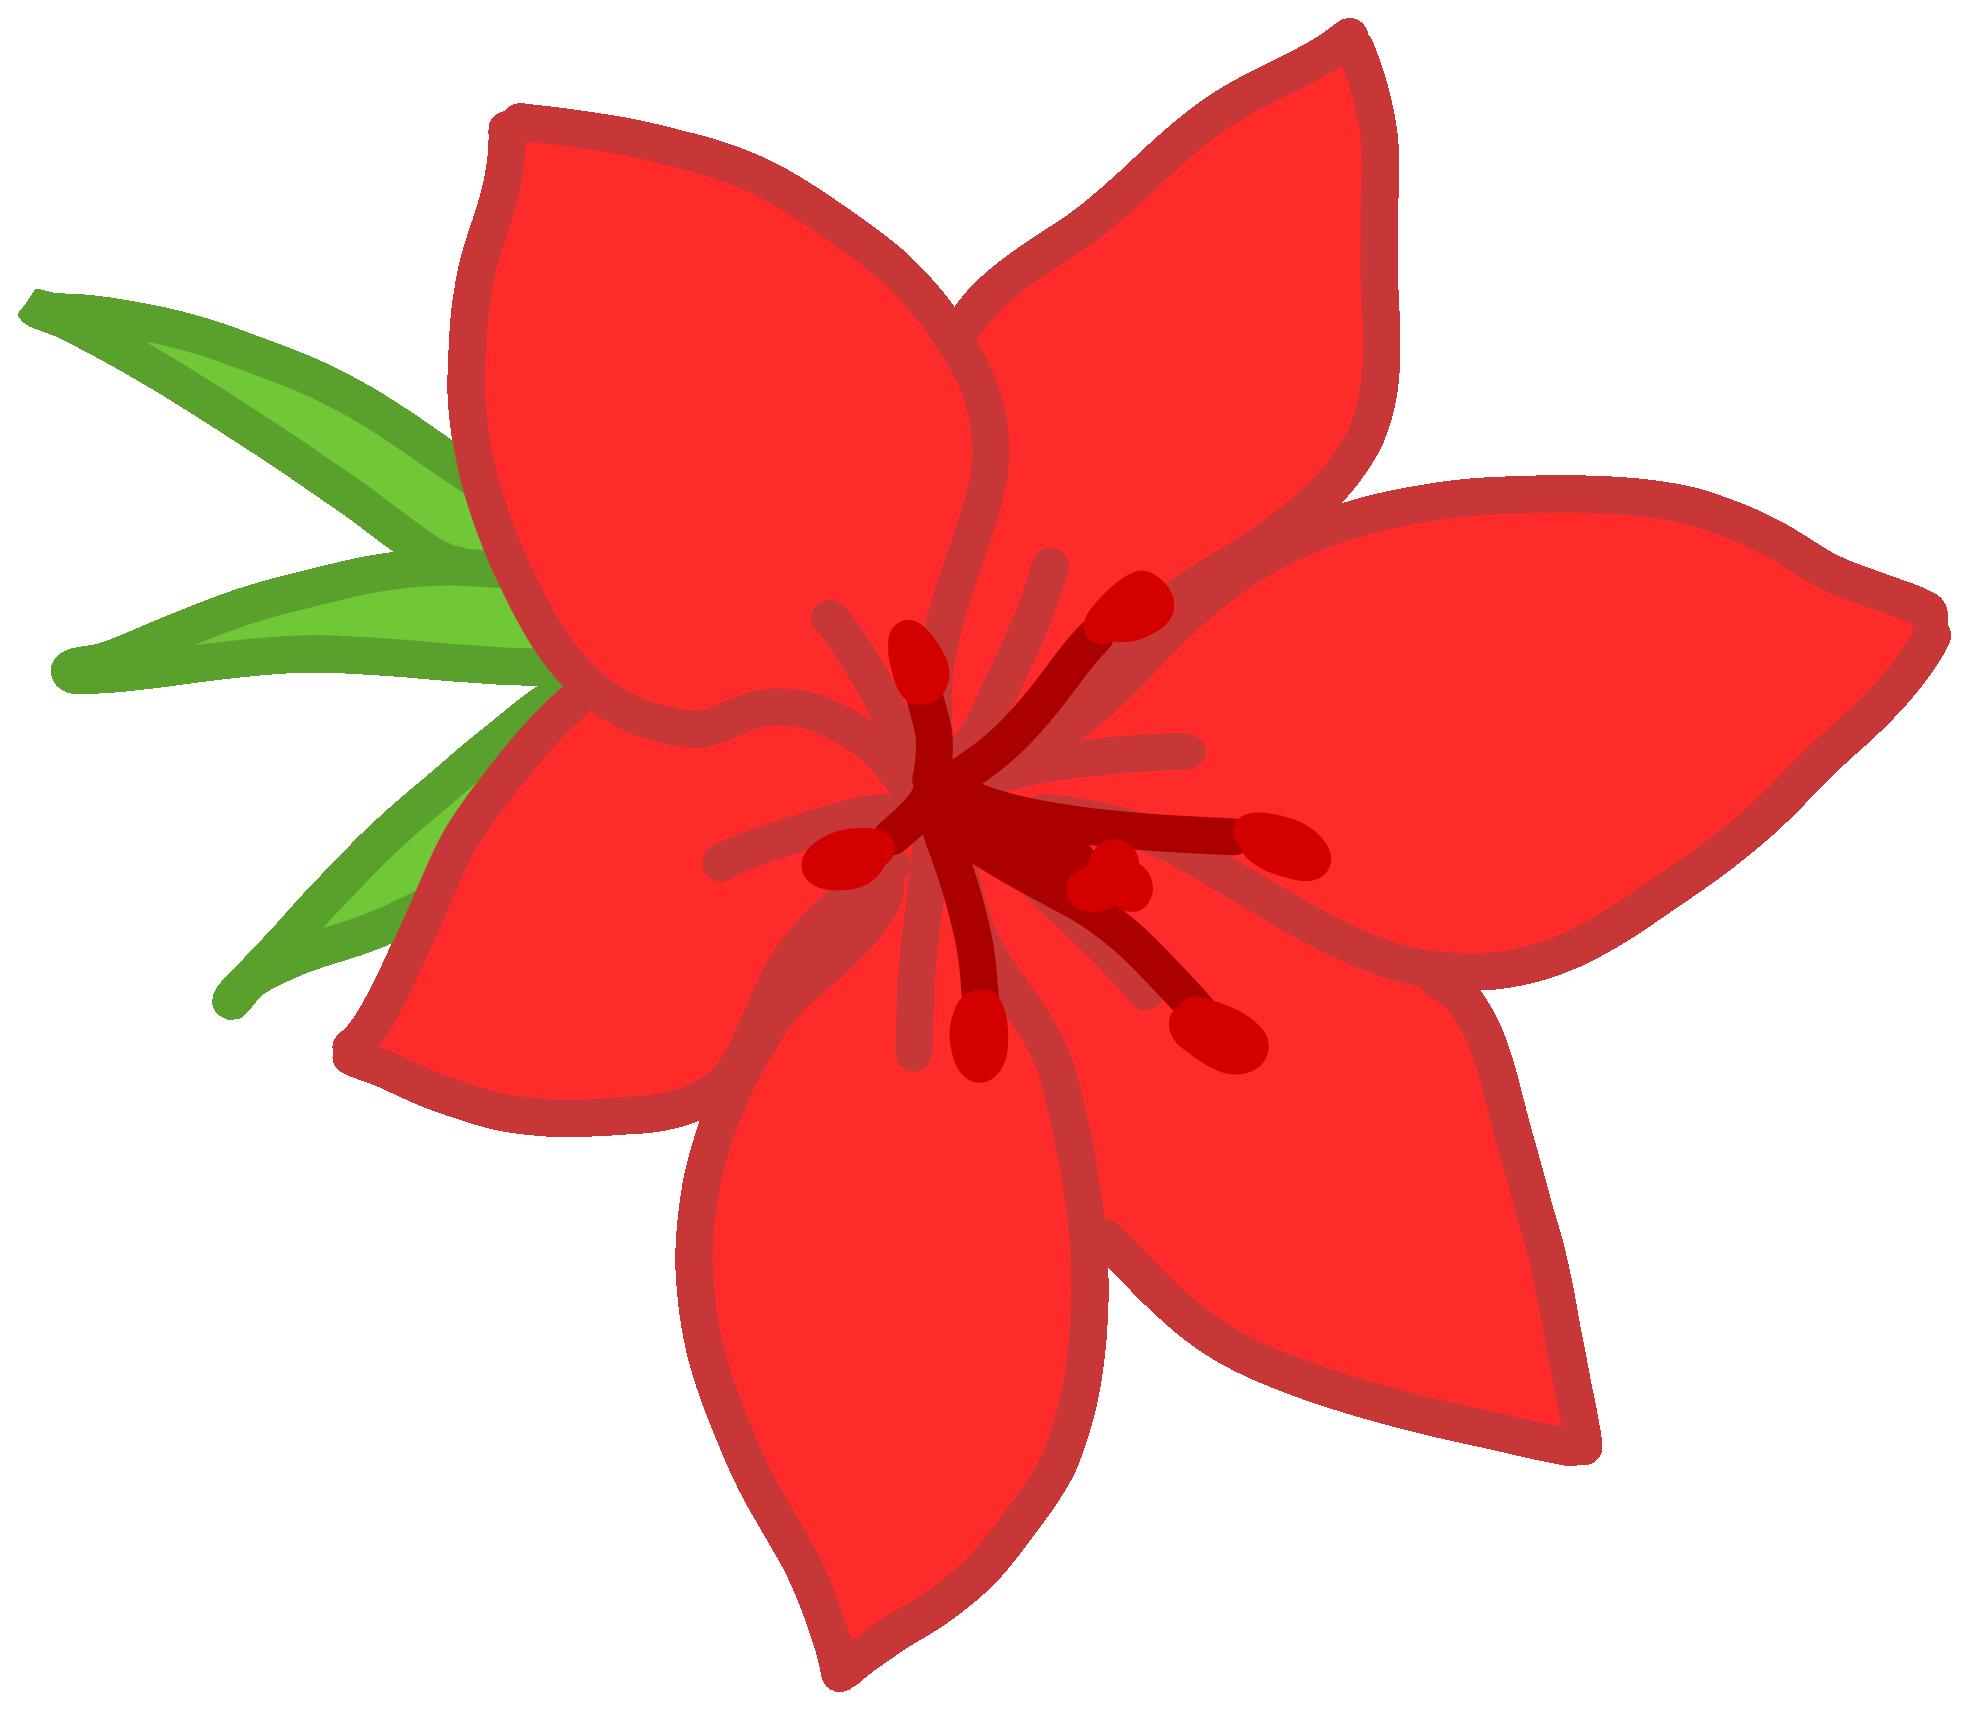 Red Flower Valentine clipartsy.com SVG clipartsy.com.